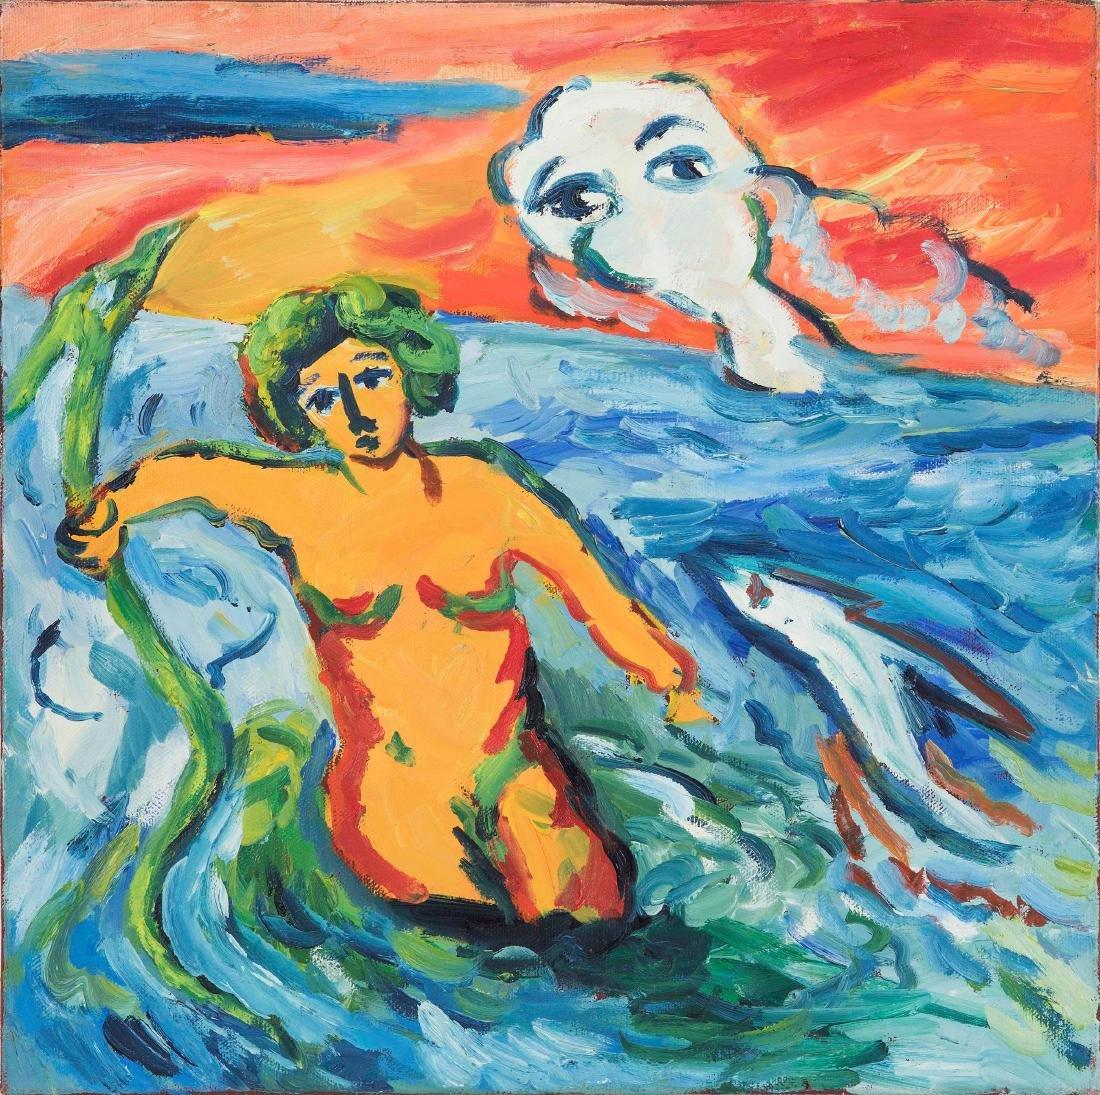 Mimmo Germanà (1944-1992), Untitled, 1987